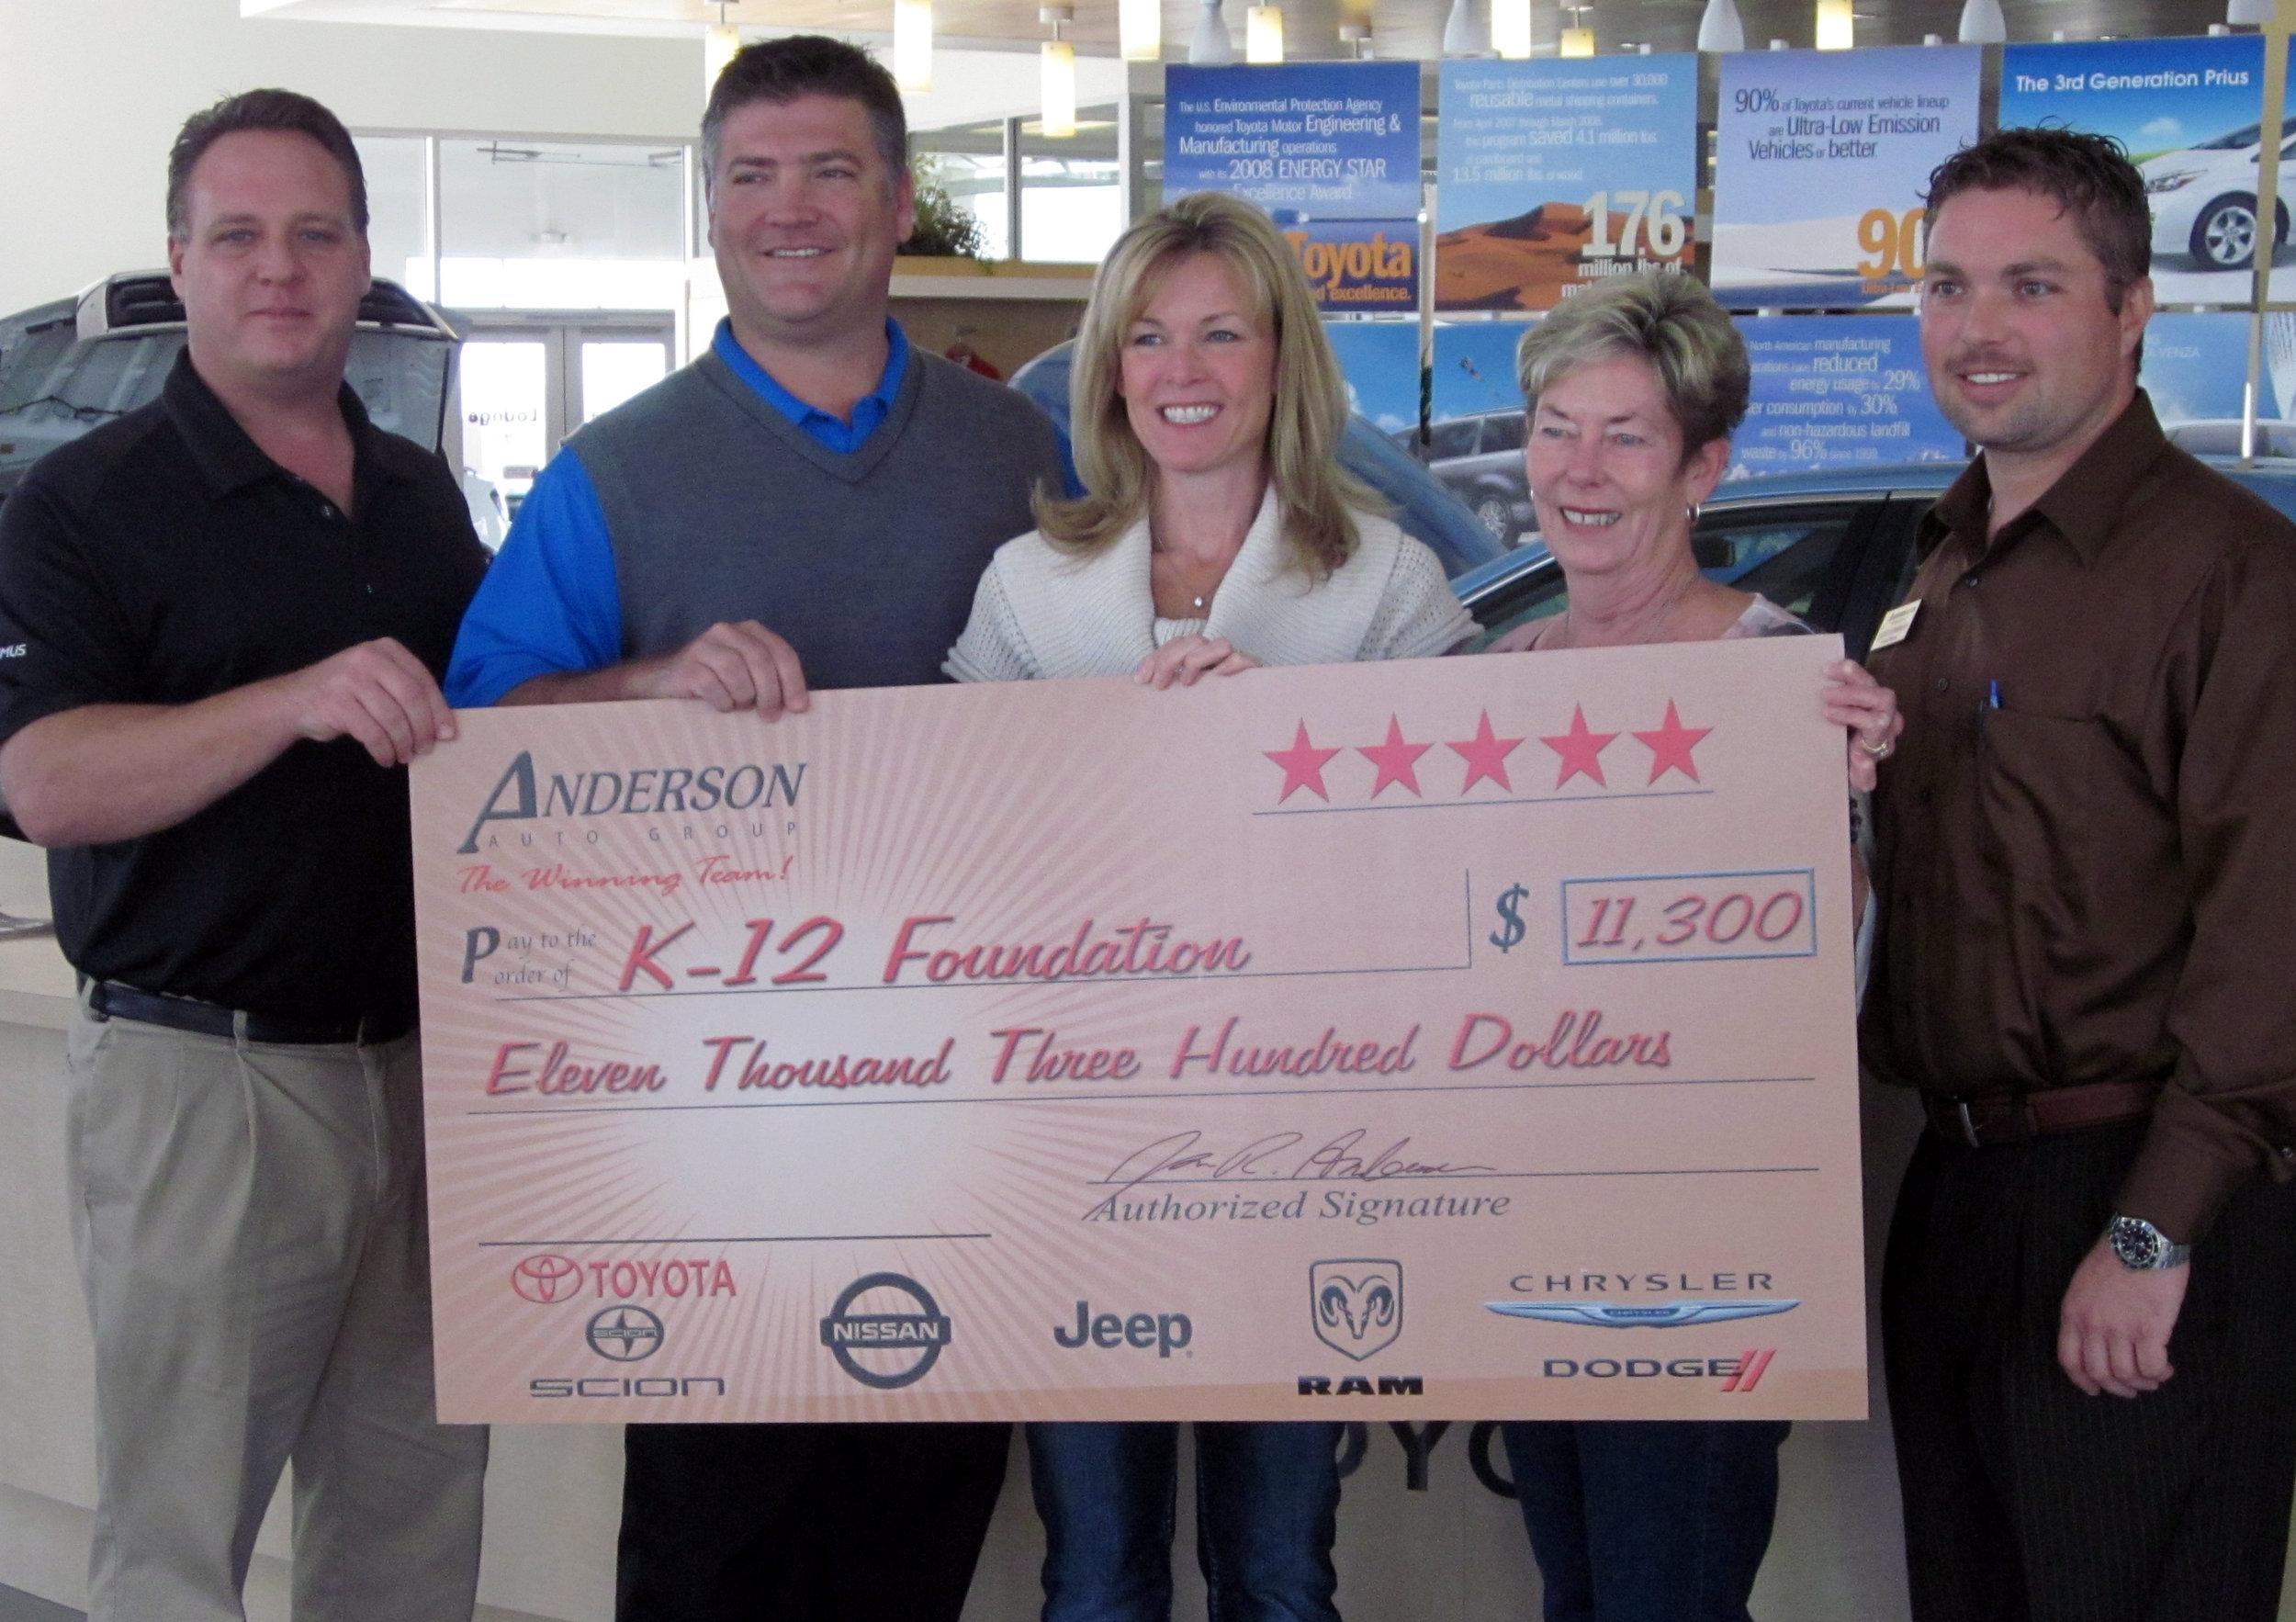 Anderson Auto Group Donation Feb 2012